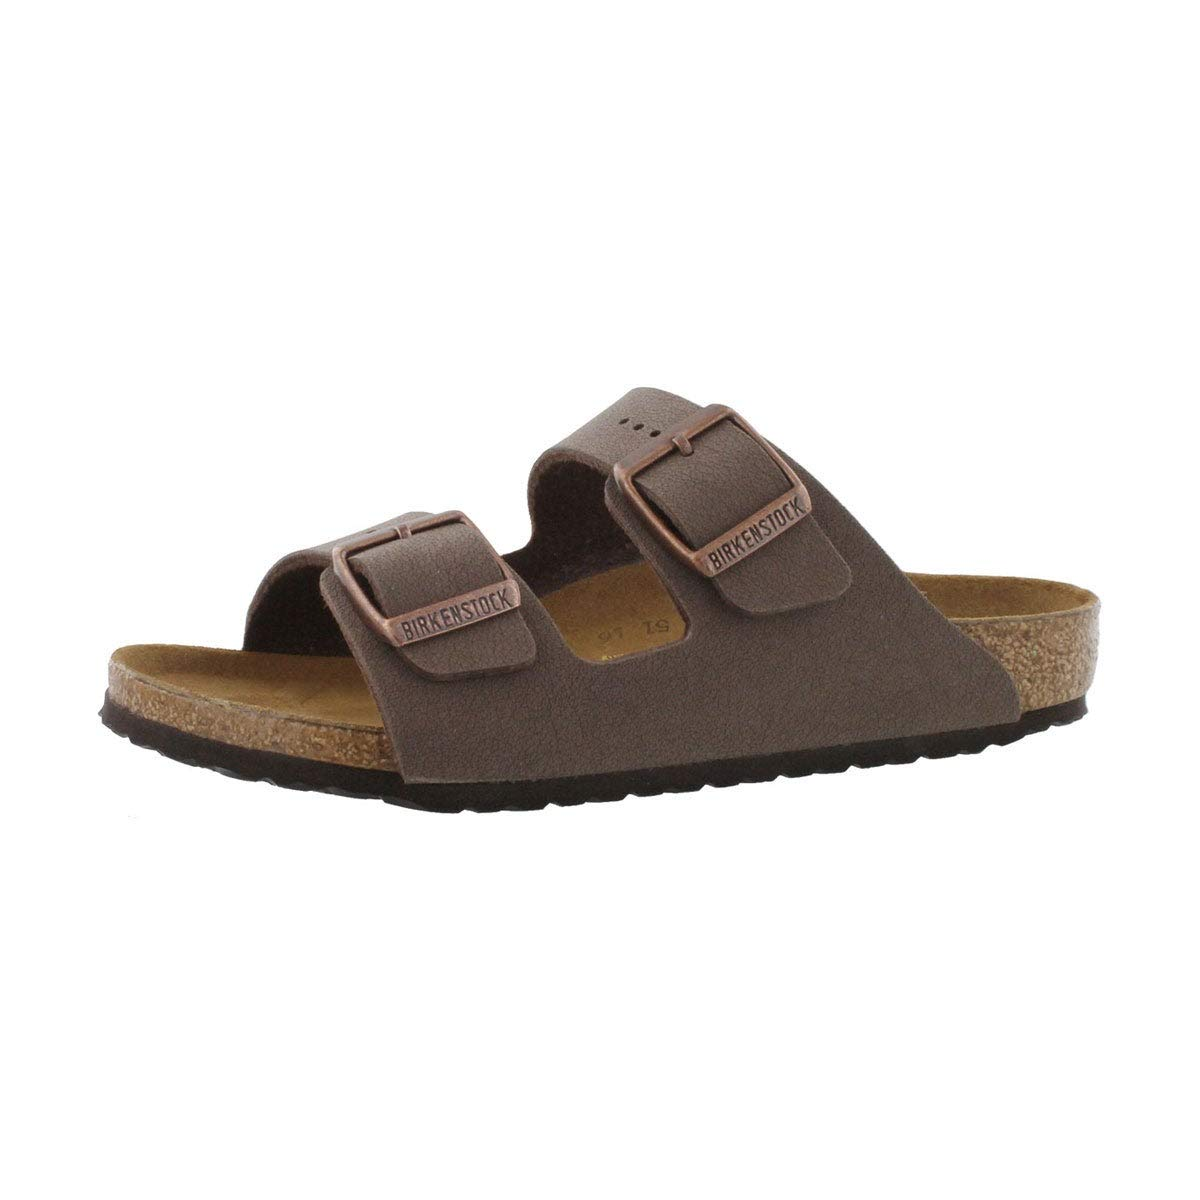 Birkenstock Children's Arizona 2-Strap Cork Footbed Sandal - Narrow Mocha 33 N EU